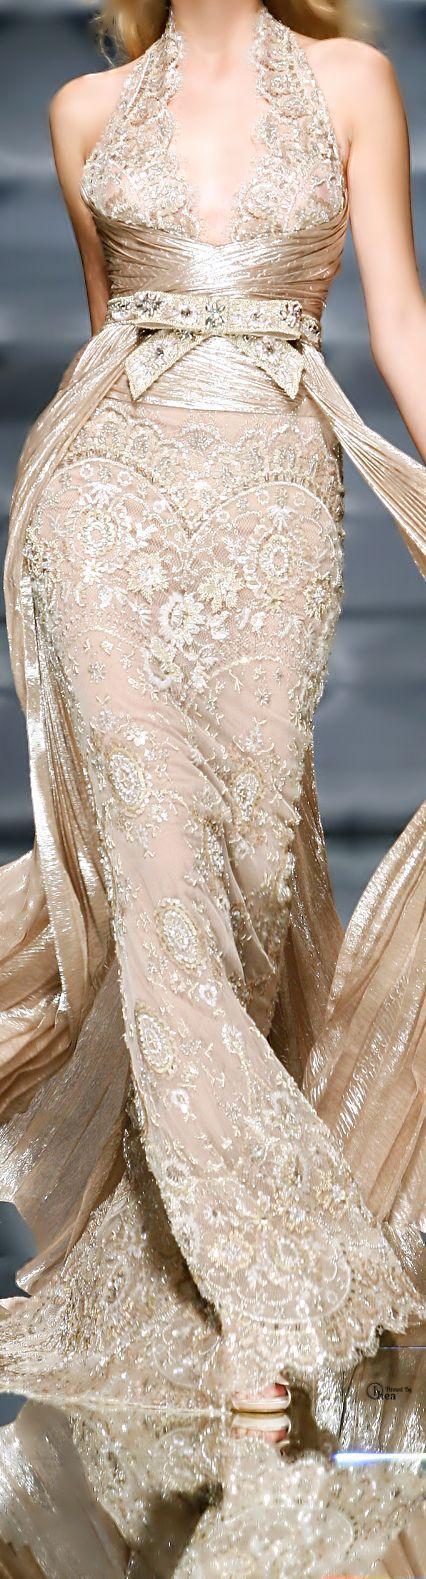 Свадьба - Women's Fashion